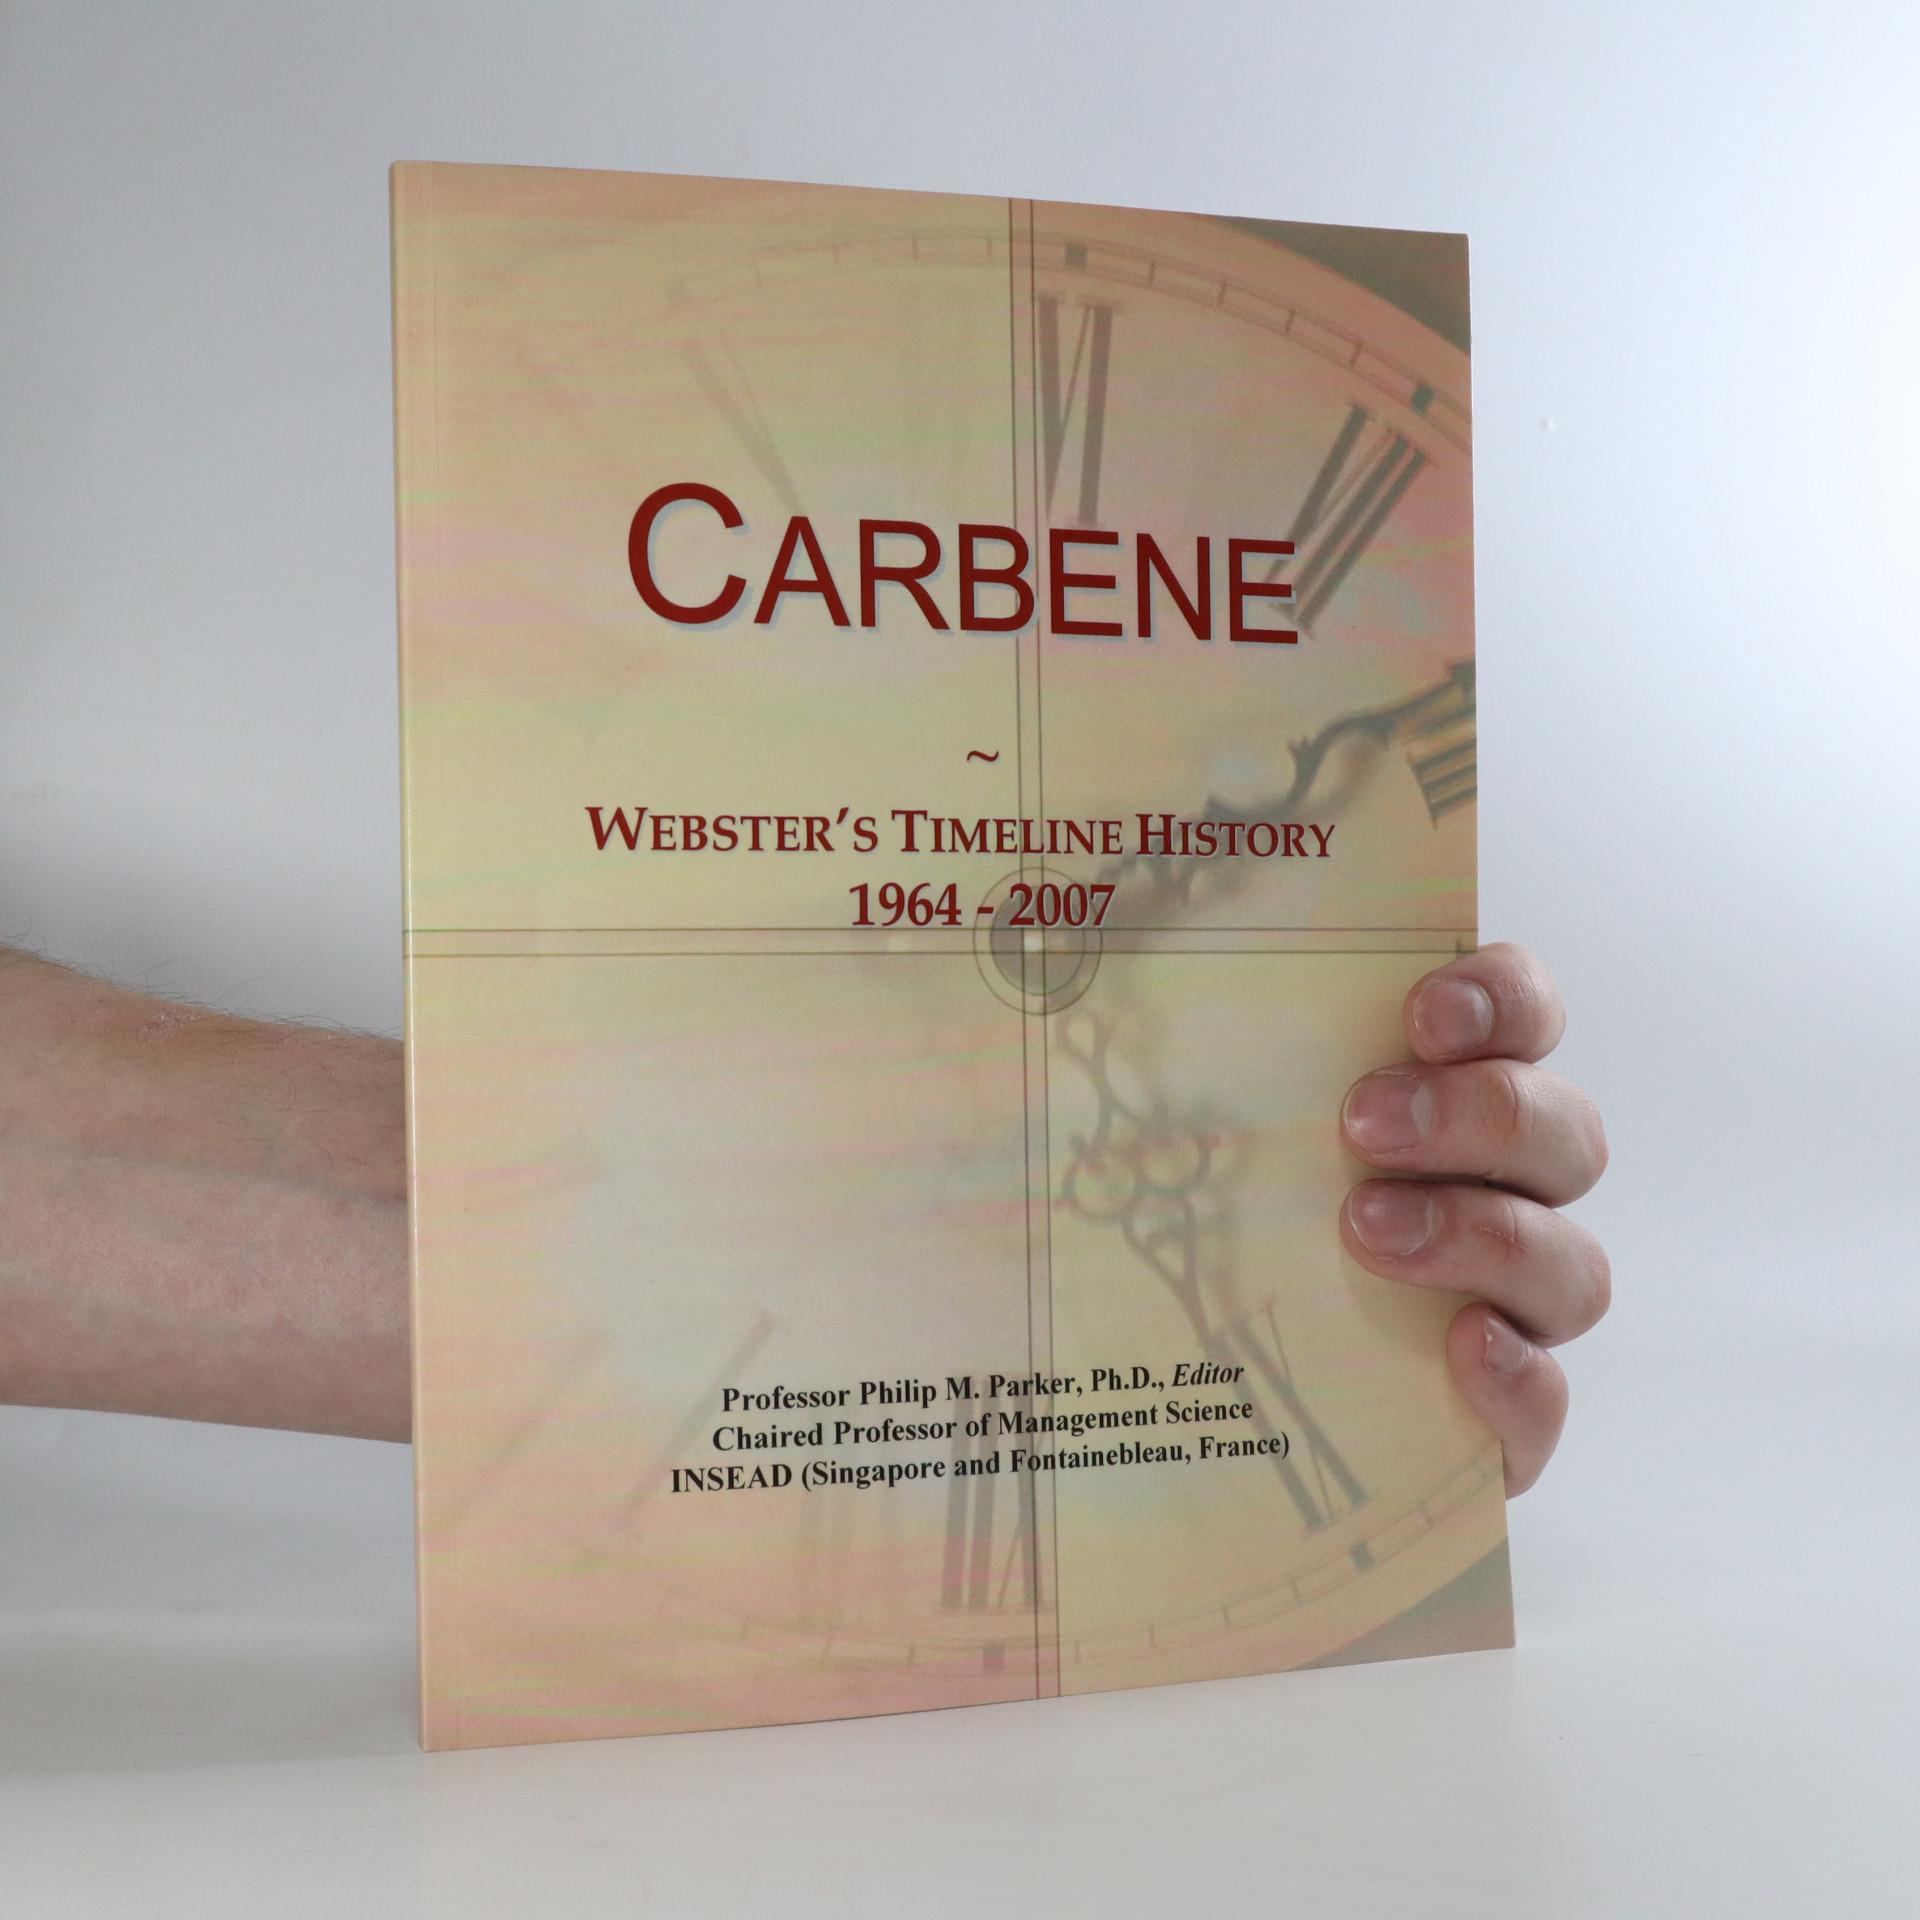 antikvární kniha Carbene. Webster's Timeline History, neuveden